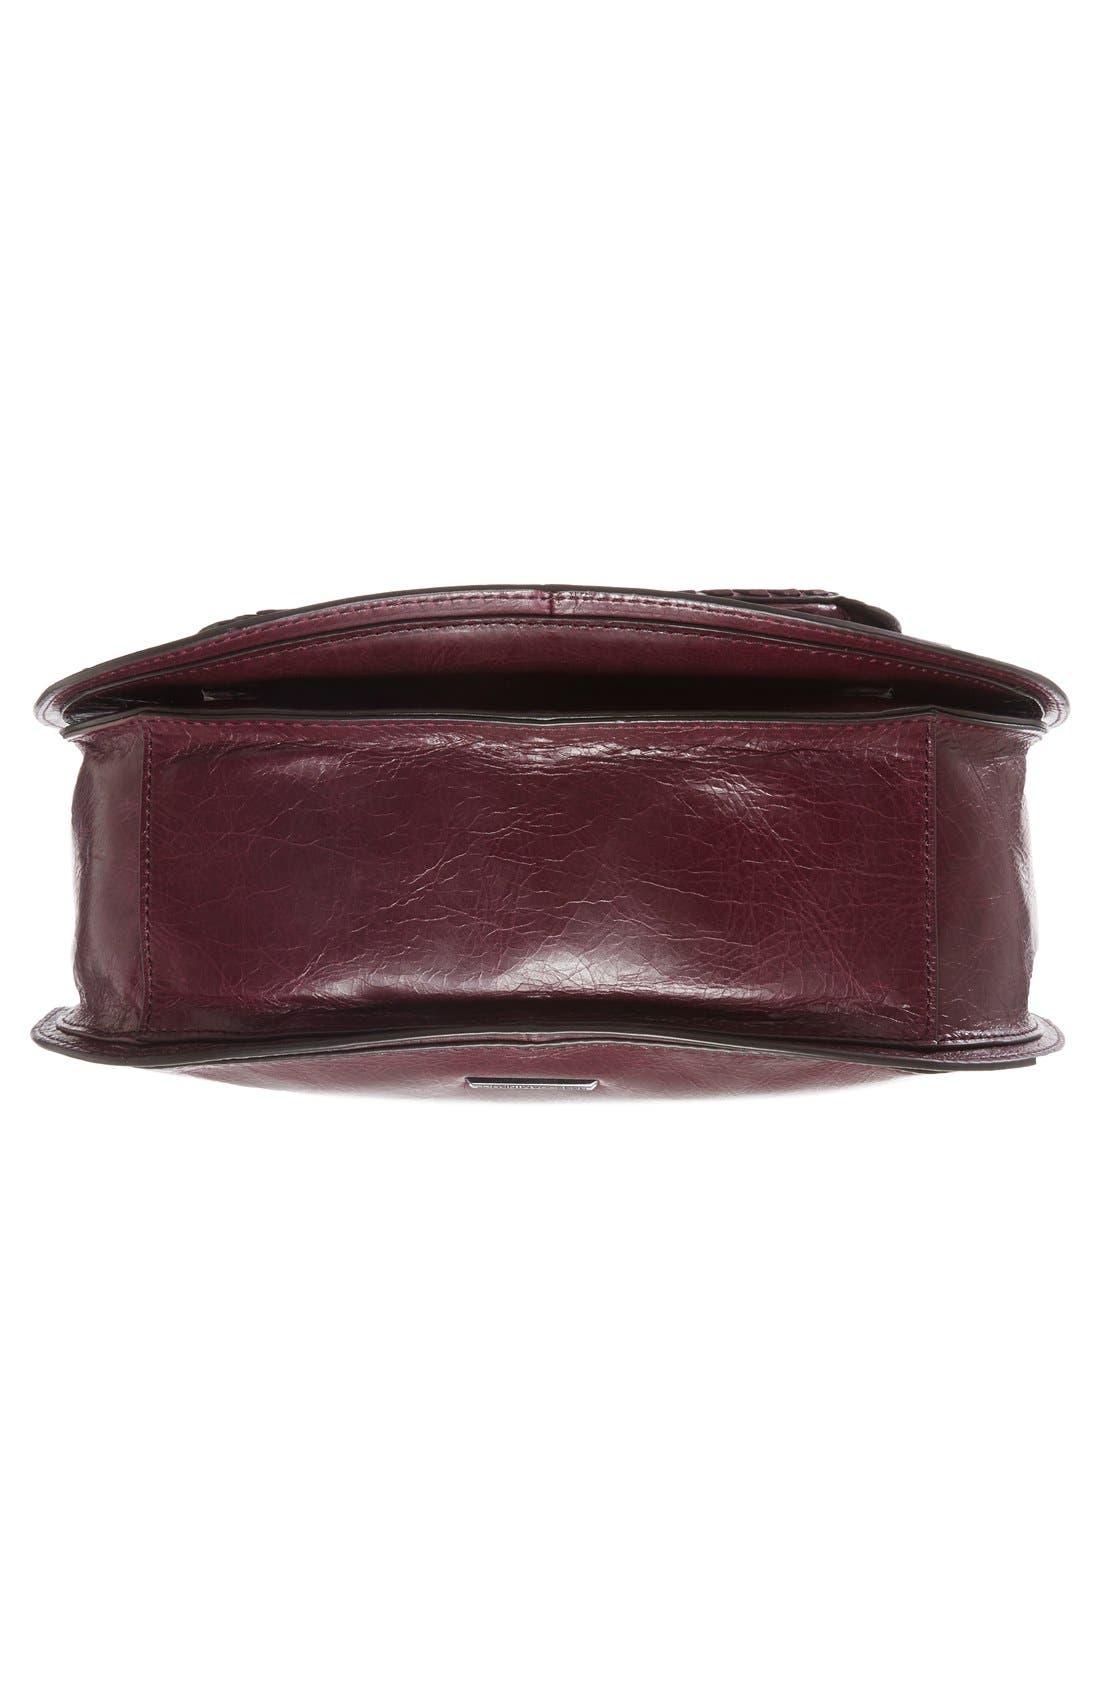 Vanity Saddle Bag,                             Alternate thumbnail 58, color,